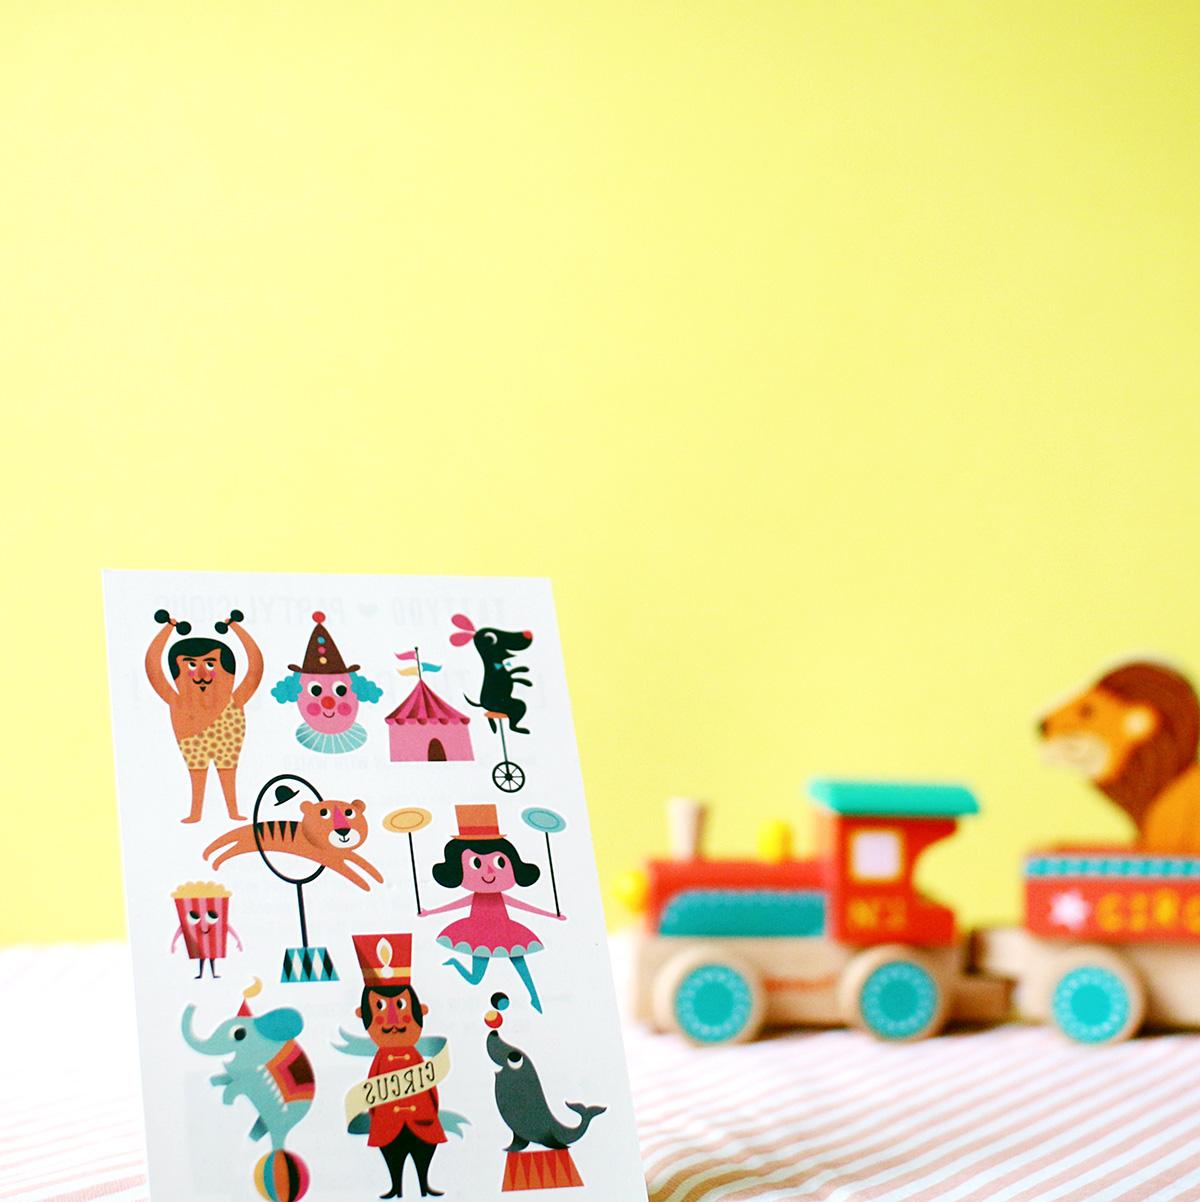 Deko-Ideen-Kinderzimmer-Zirkus-Thema-Motto